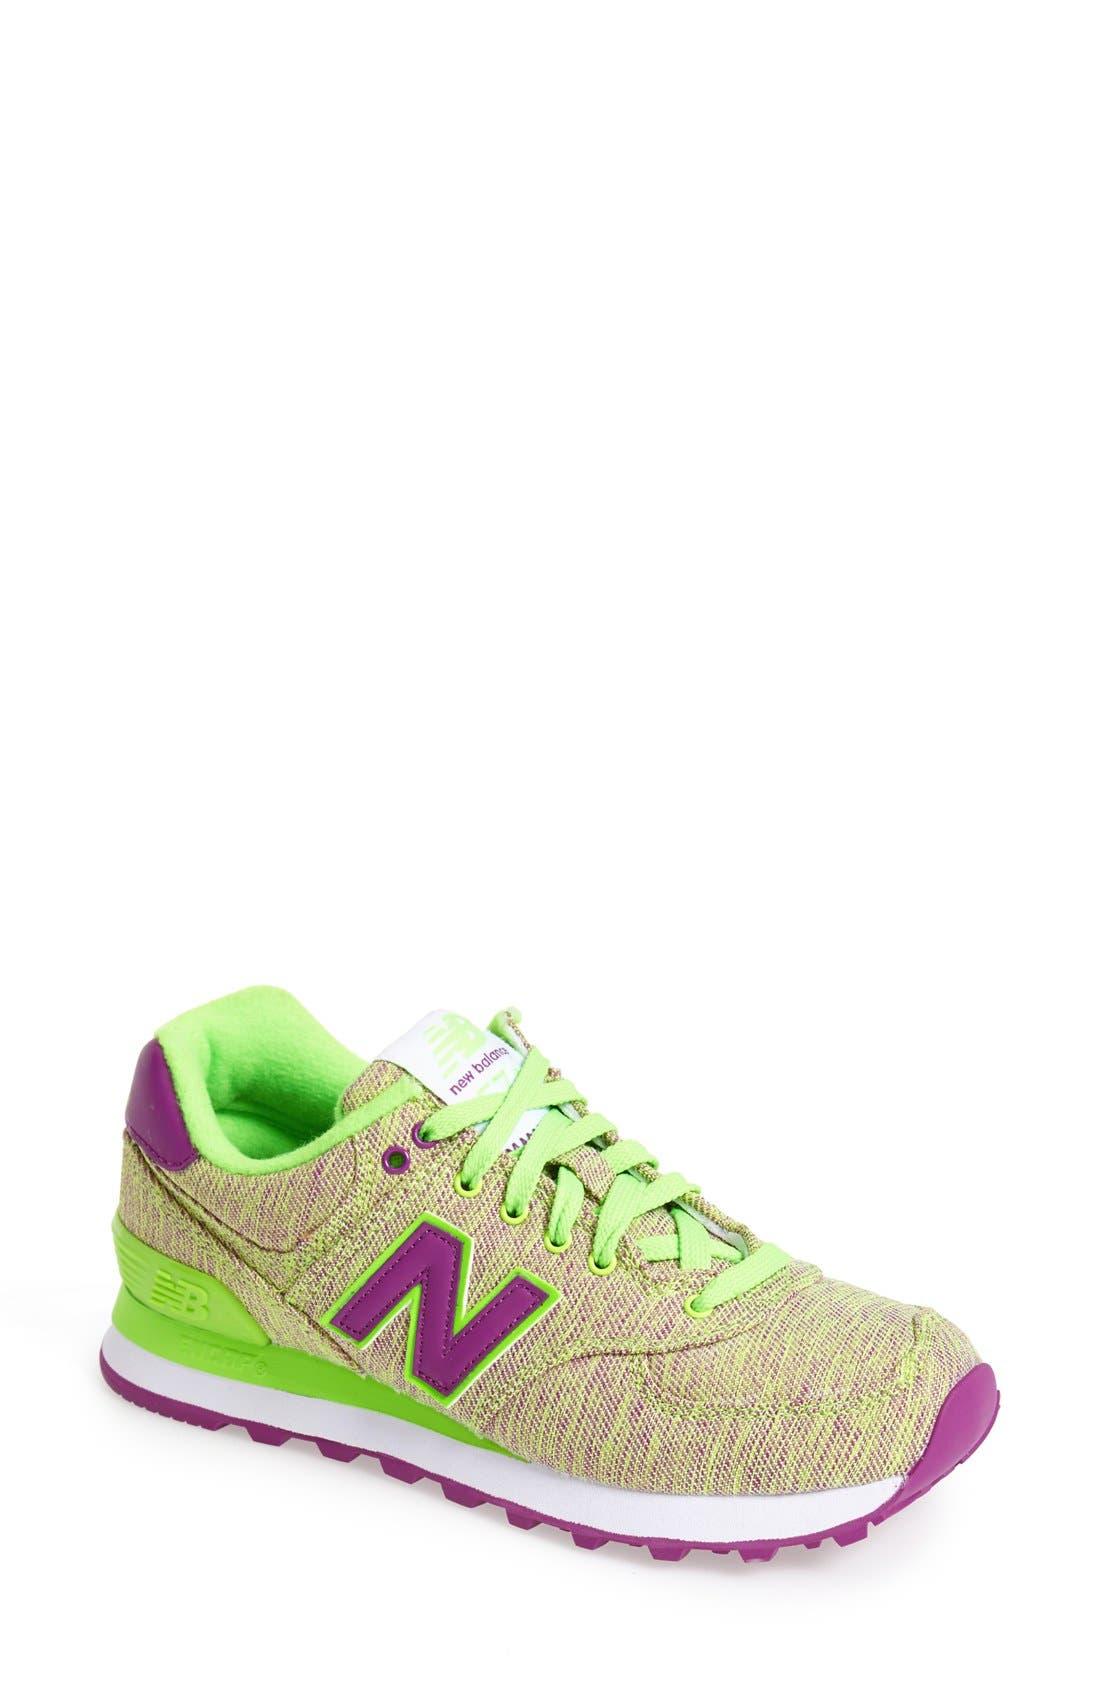 Main Image - New Balance '574 - Static' Sneaker (Women)